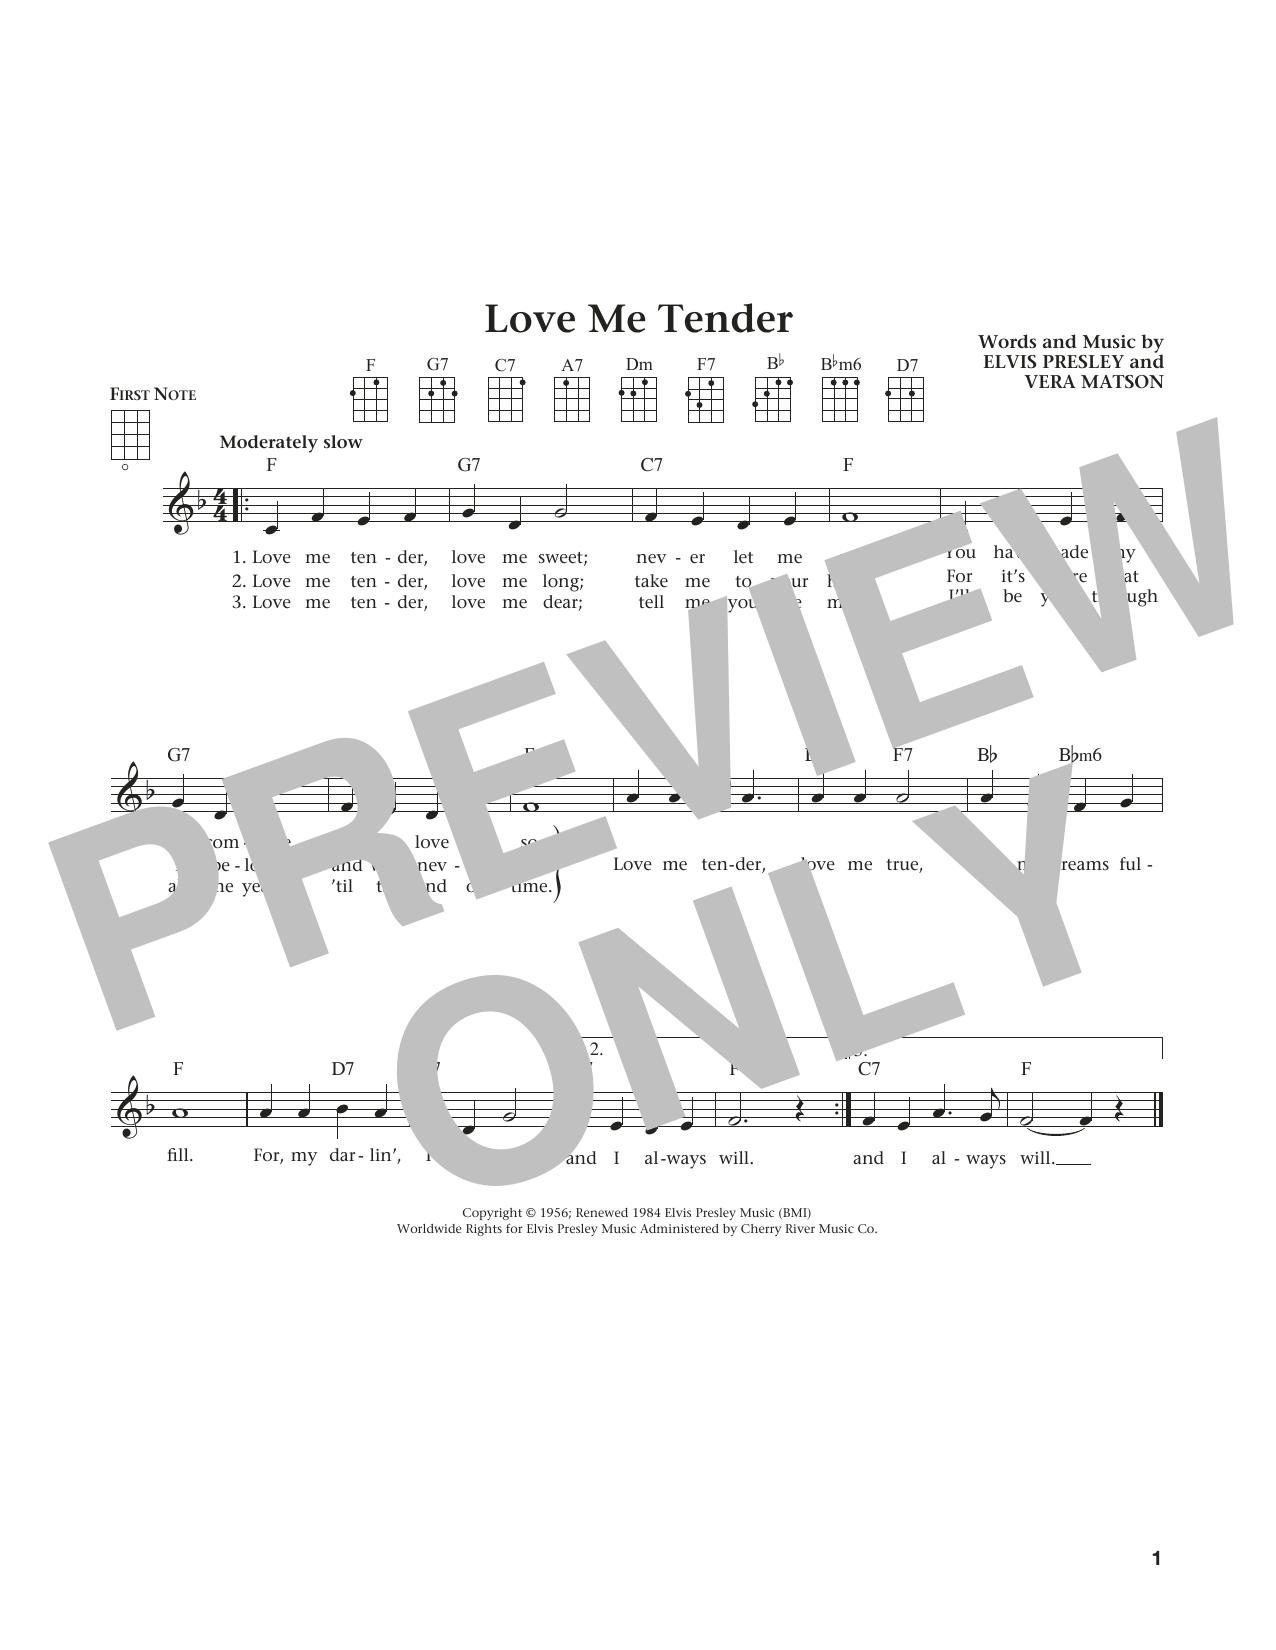 Sheet Music Digital Files To Print Licensed Vera Matson Digital